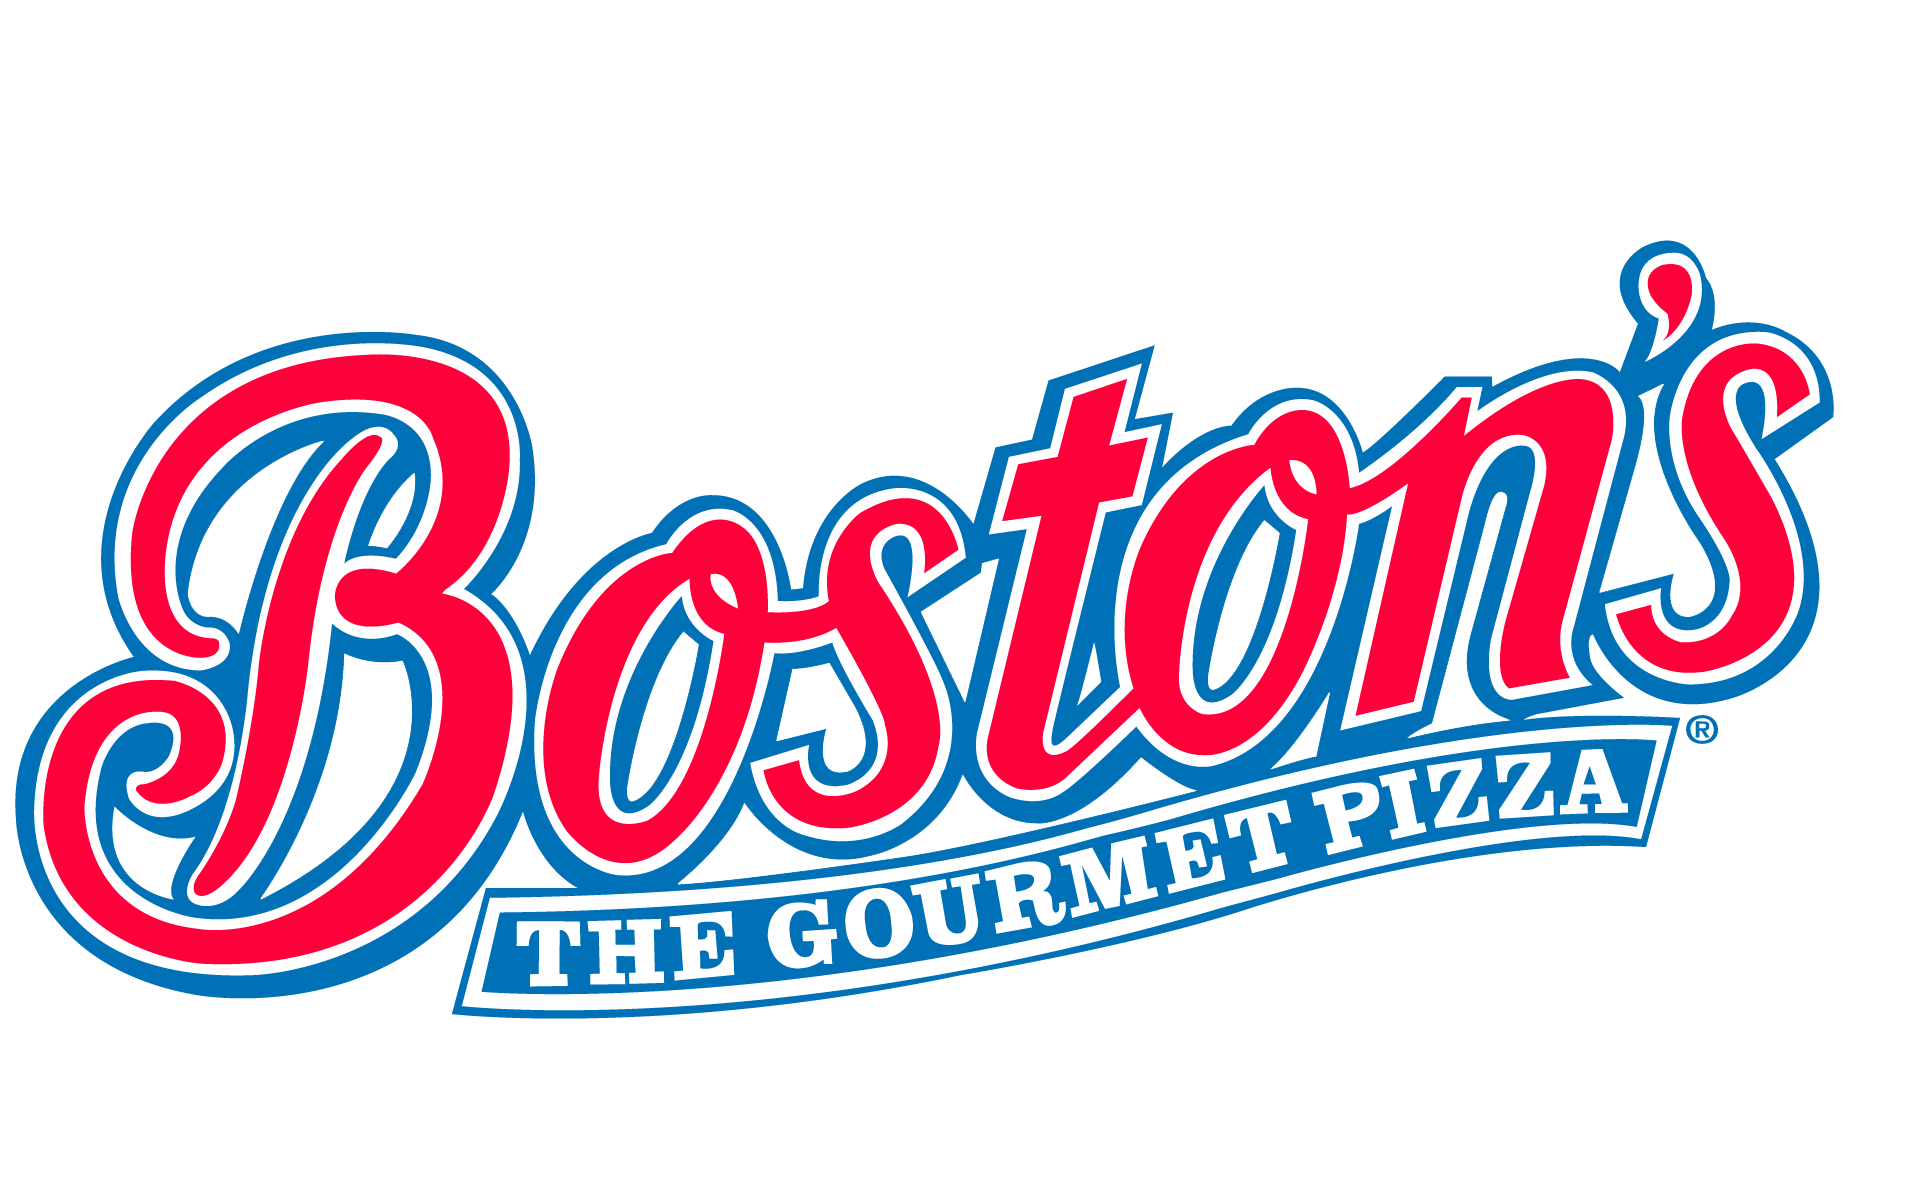 bostons-01